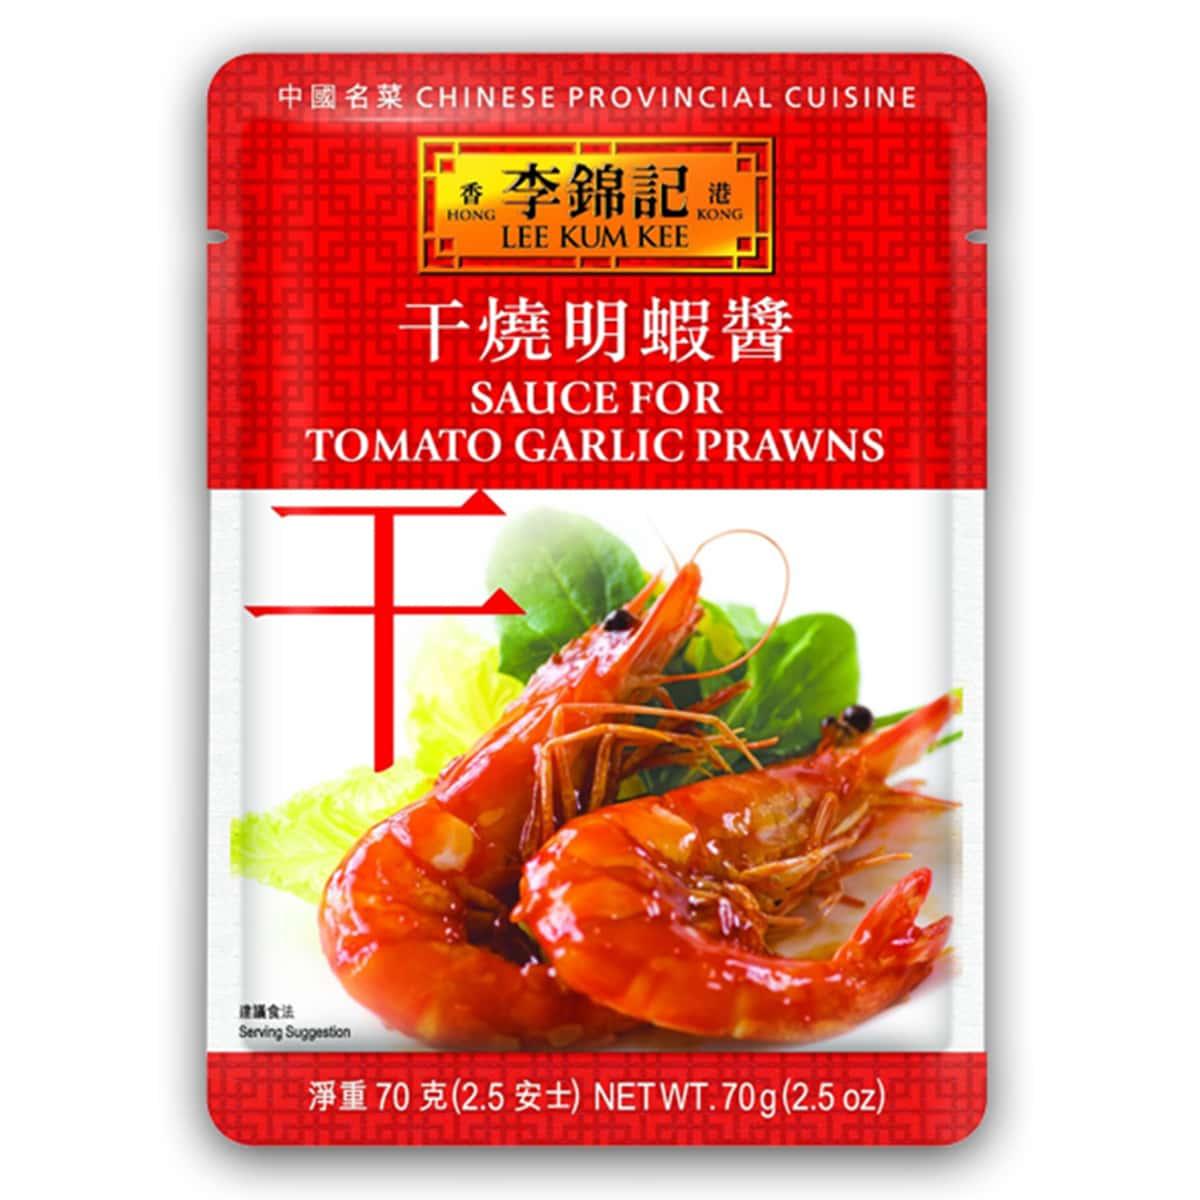 Buy Lee Kum Kee Sauce for Tomato Garlic Prawn - 70 gm